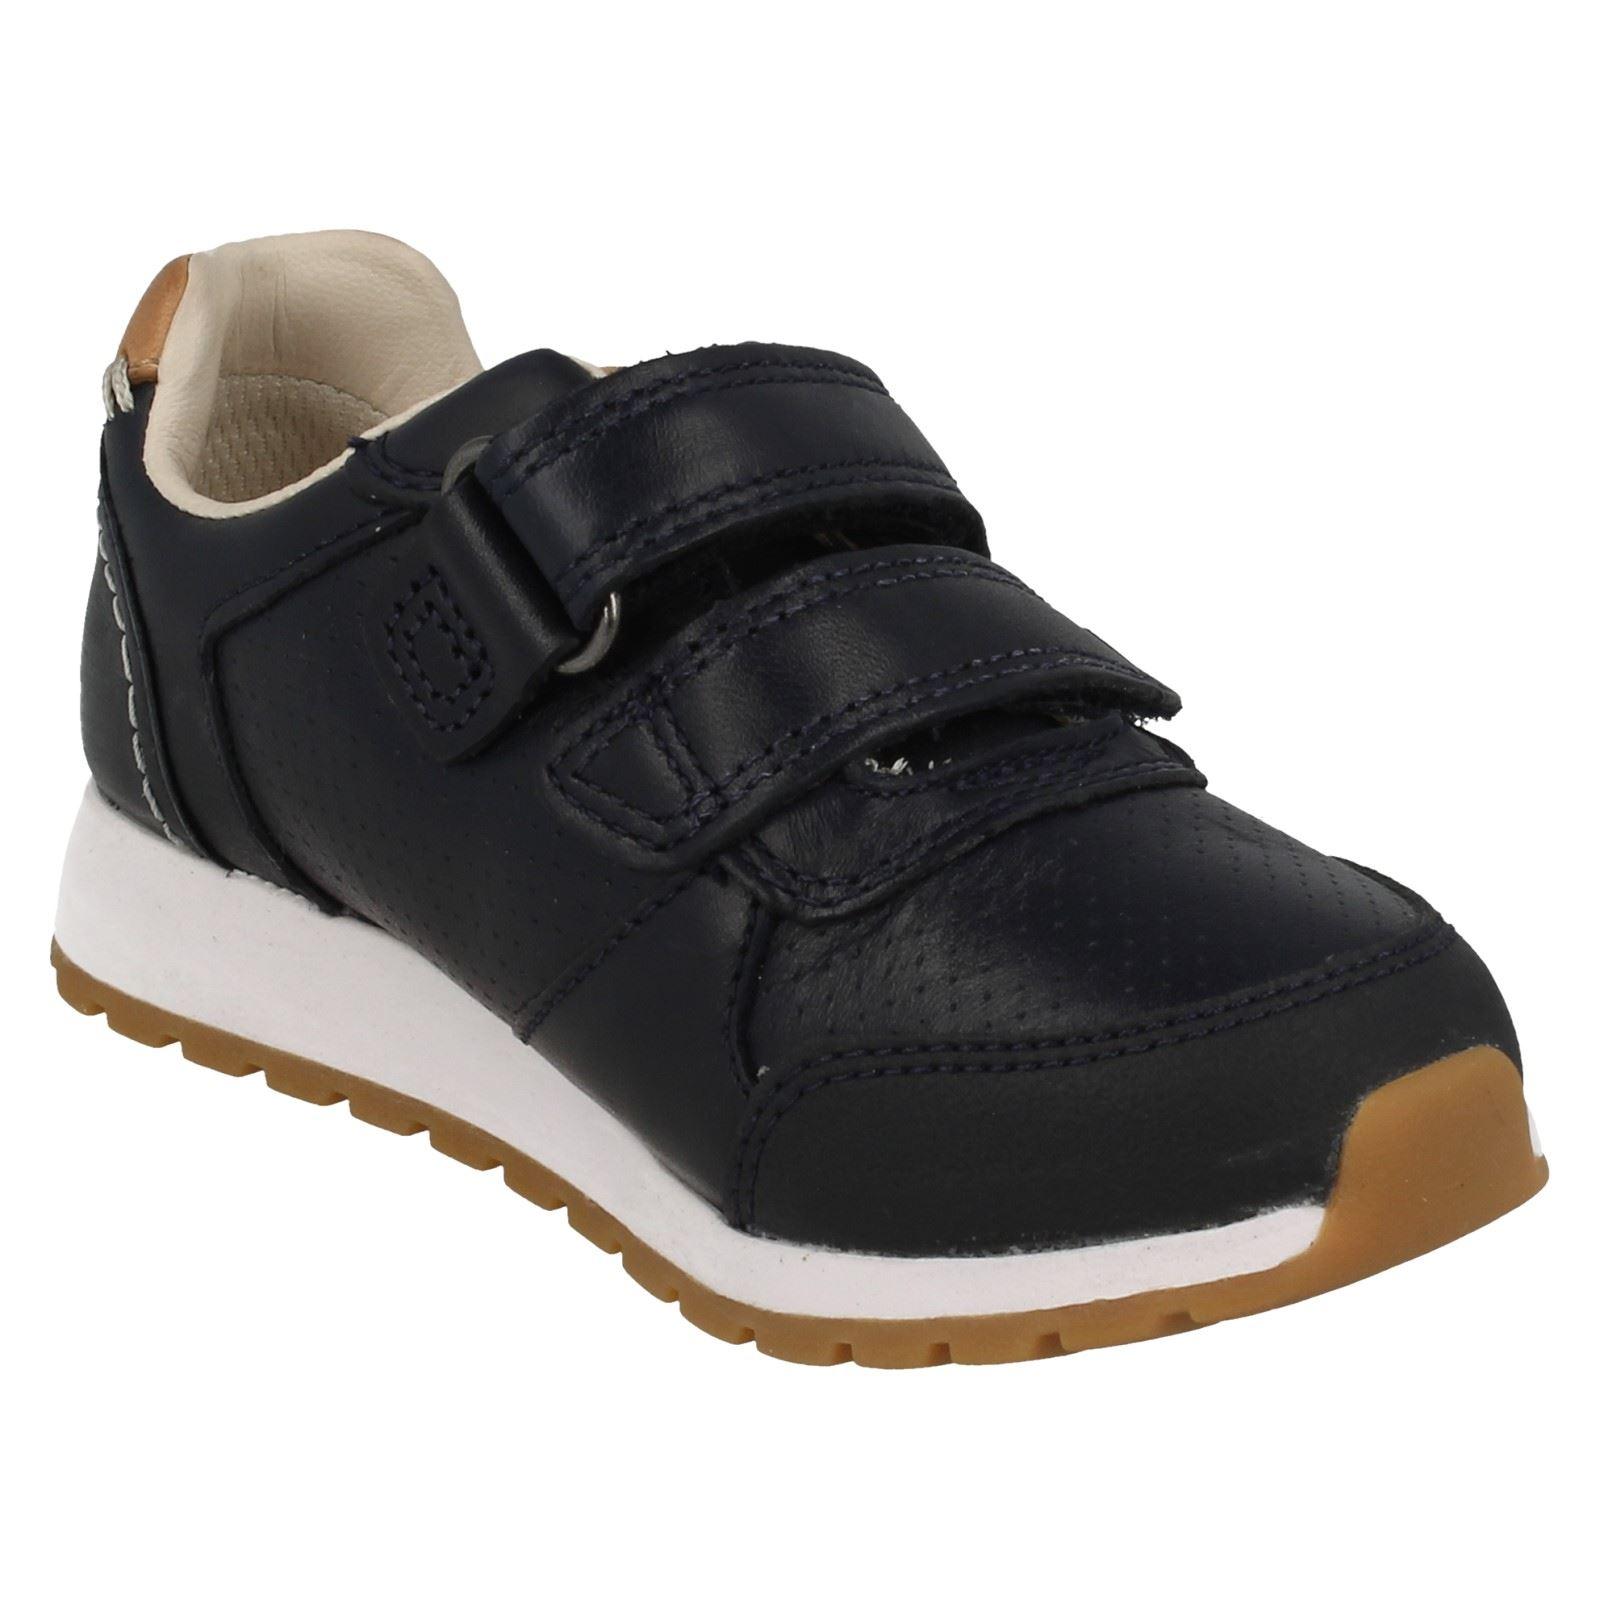 Tex niños Zapatos Zest estilo Clarks azul para Navy con rwCTIYCnq